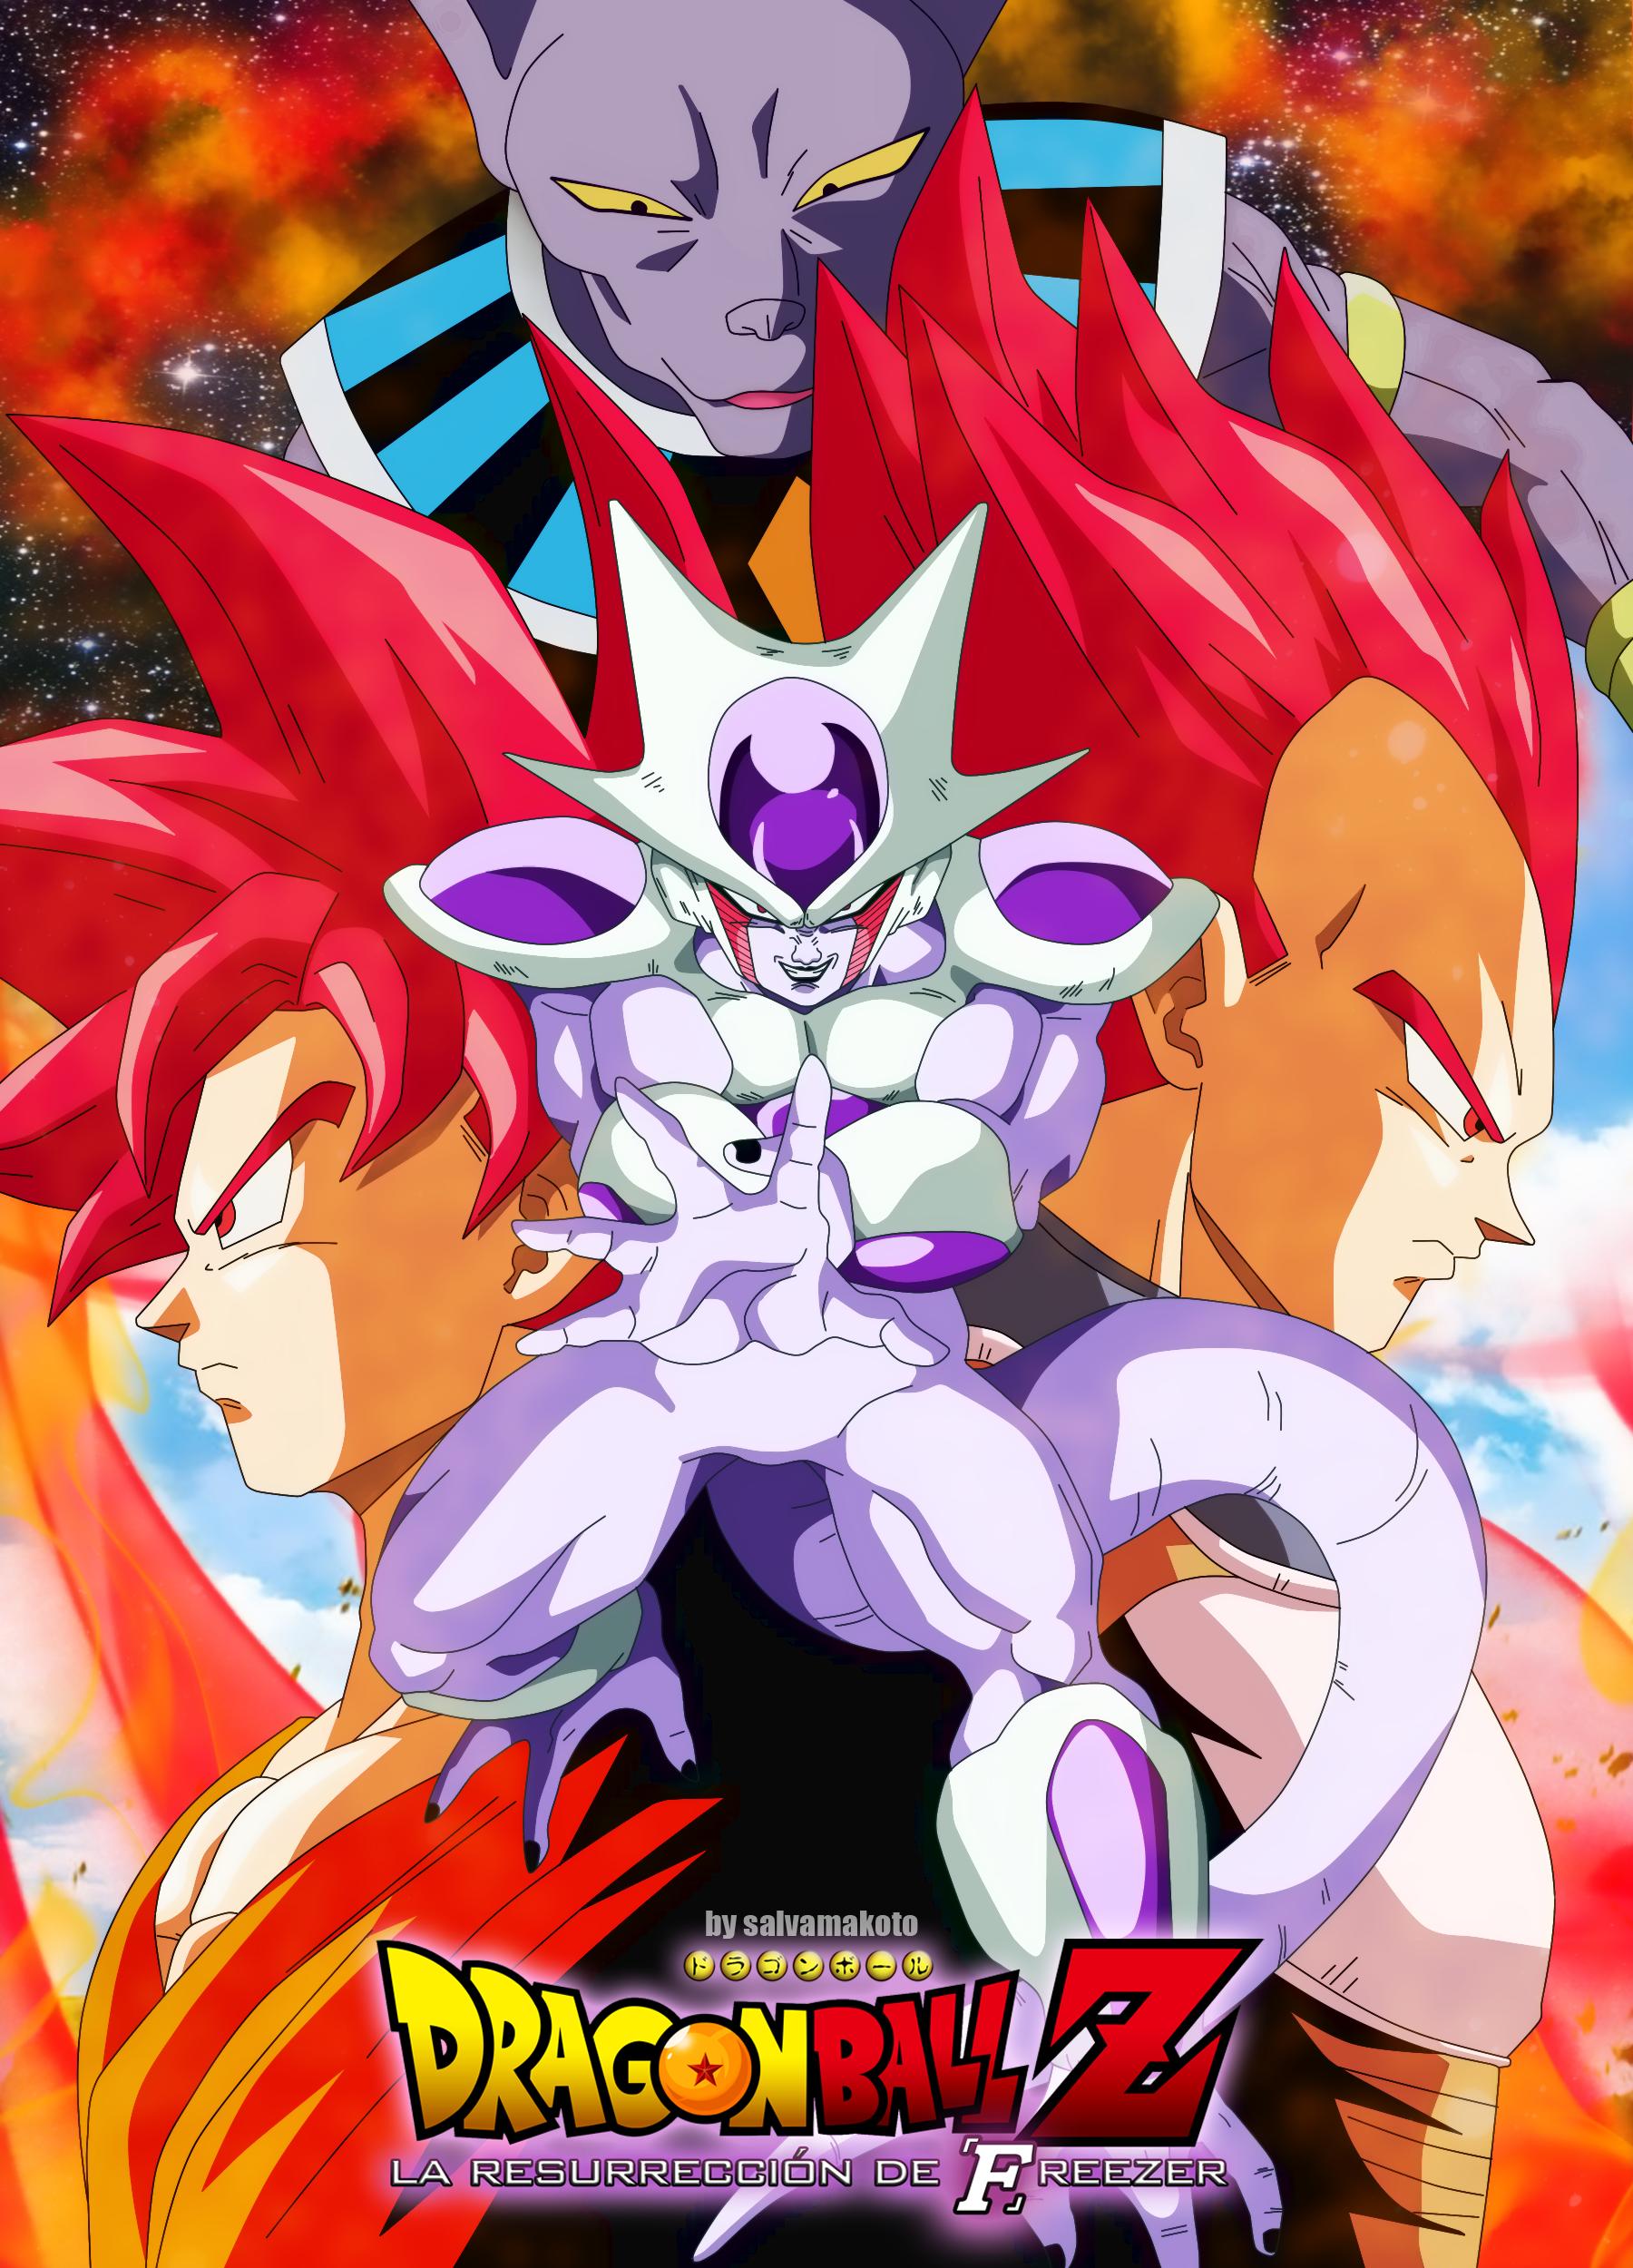 Dragon Ball Resurrection De Freezer : dragon, resurrection, freezer, Resurreccion, Freezer, Dragon, Wallpapers,, Anime, Super,, Super, Manga